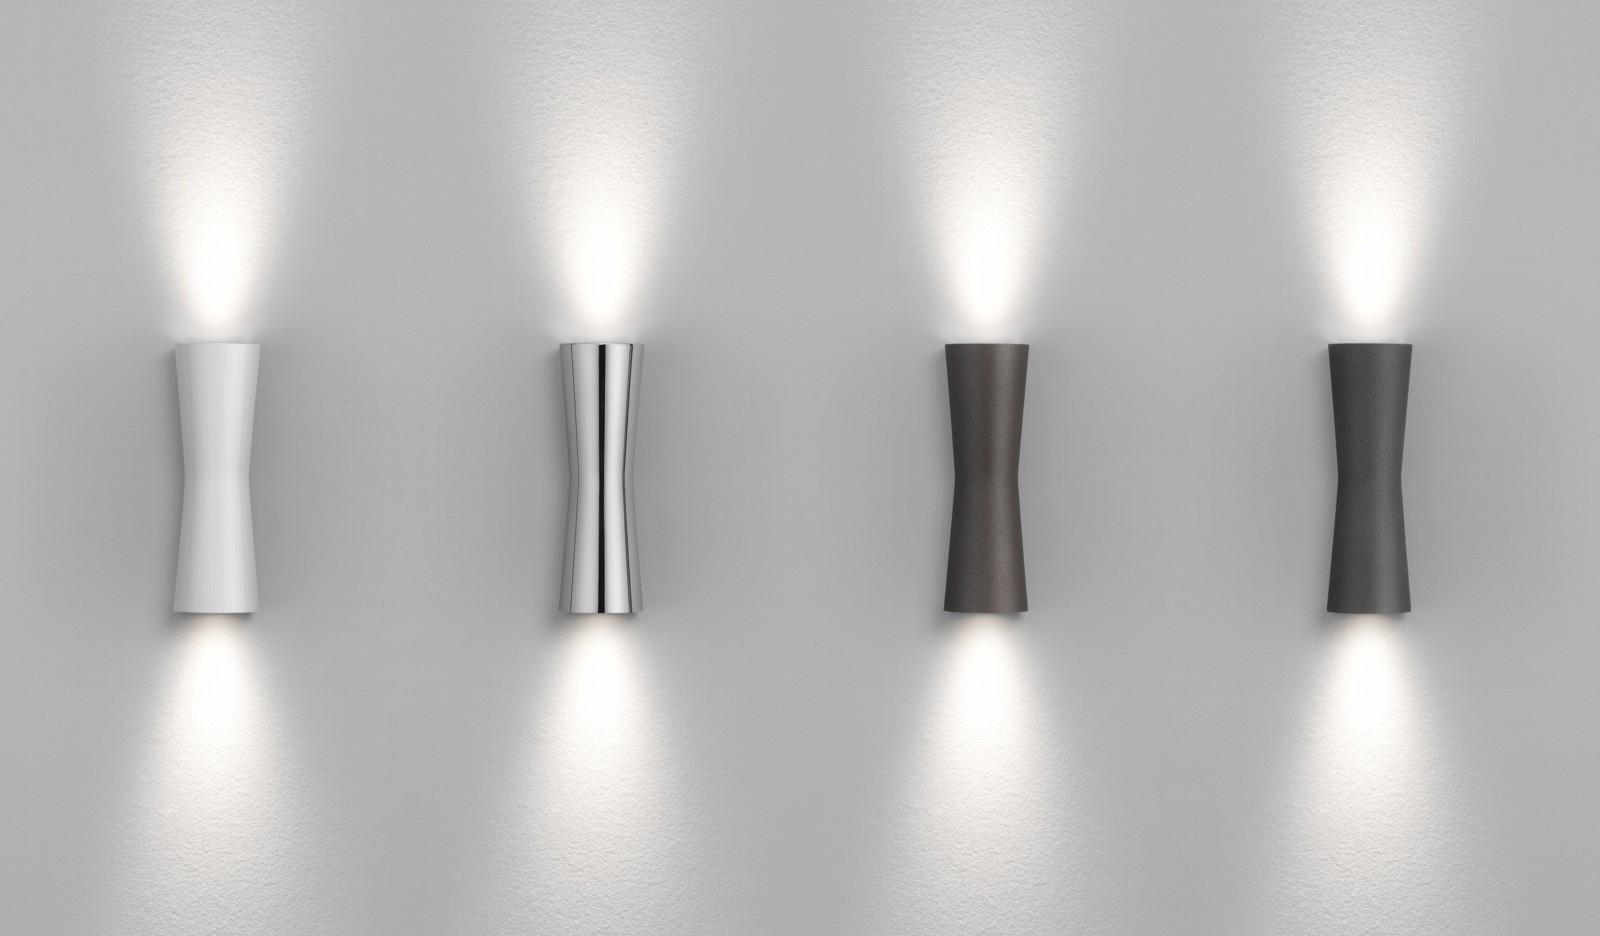 modern outdoor sensor wall lights. up and down outdoor wall lights \u2013 10 ways to improvise the look of entrance modern sensor